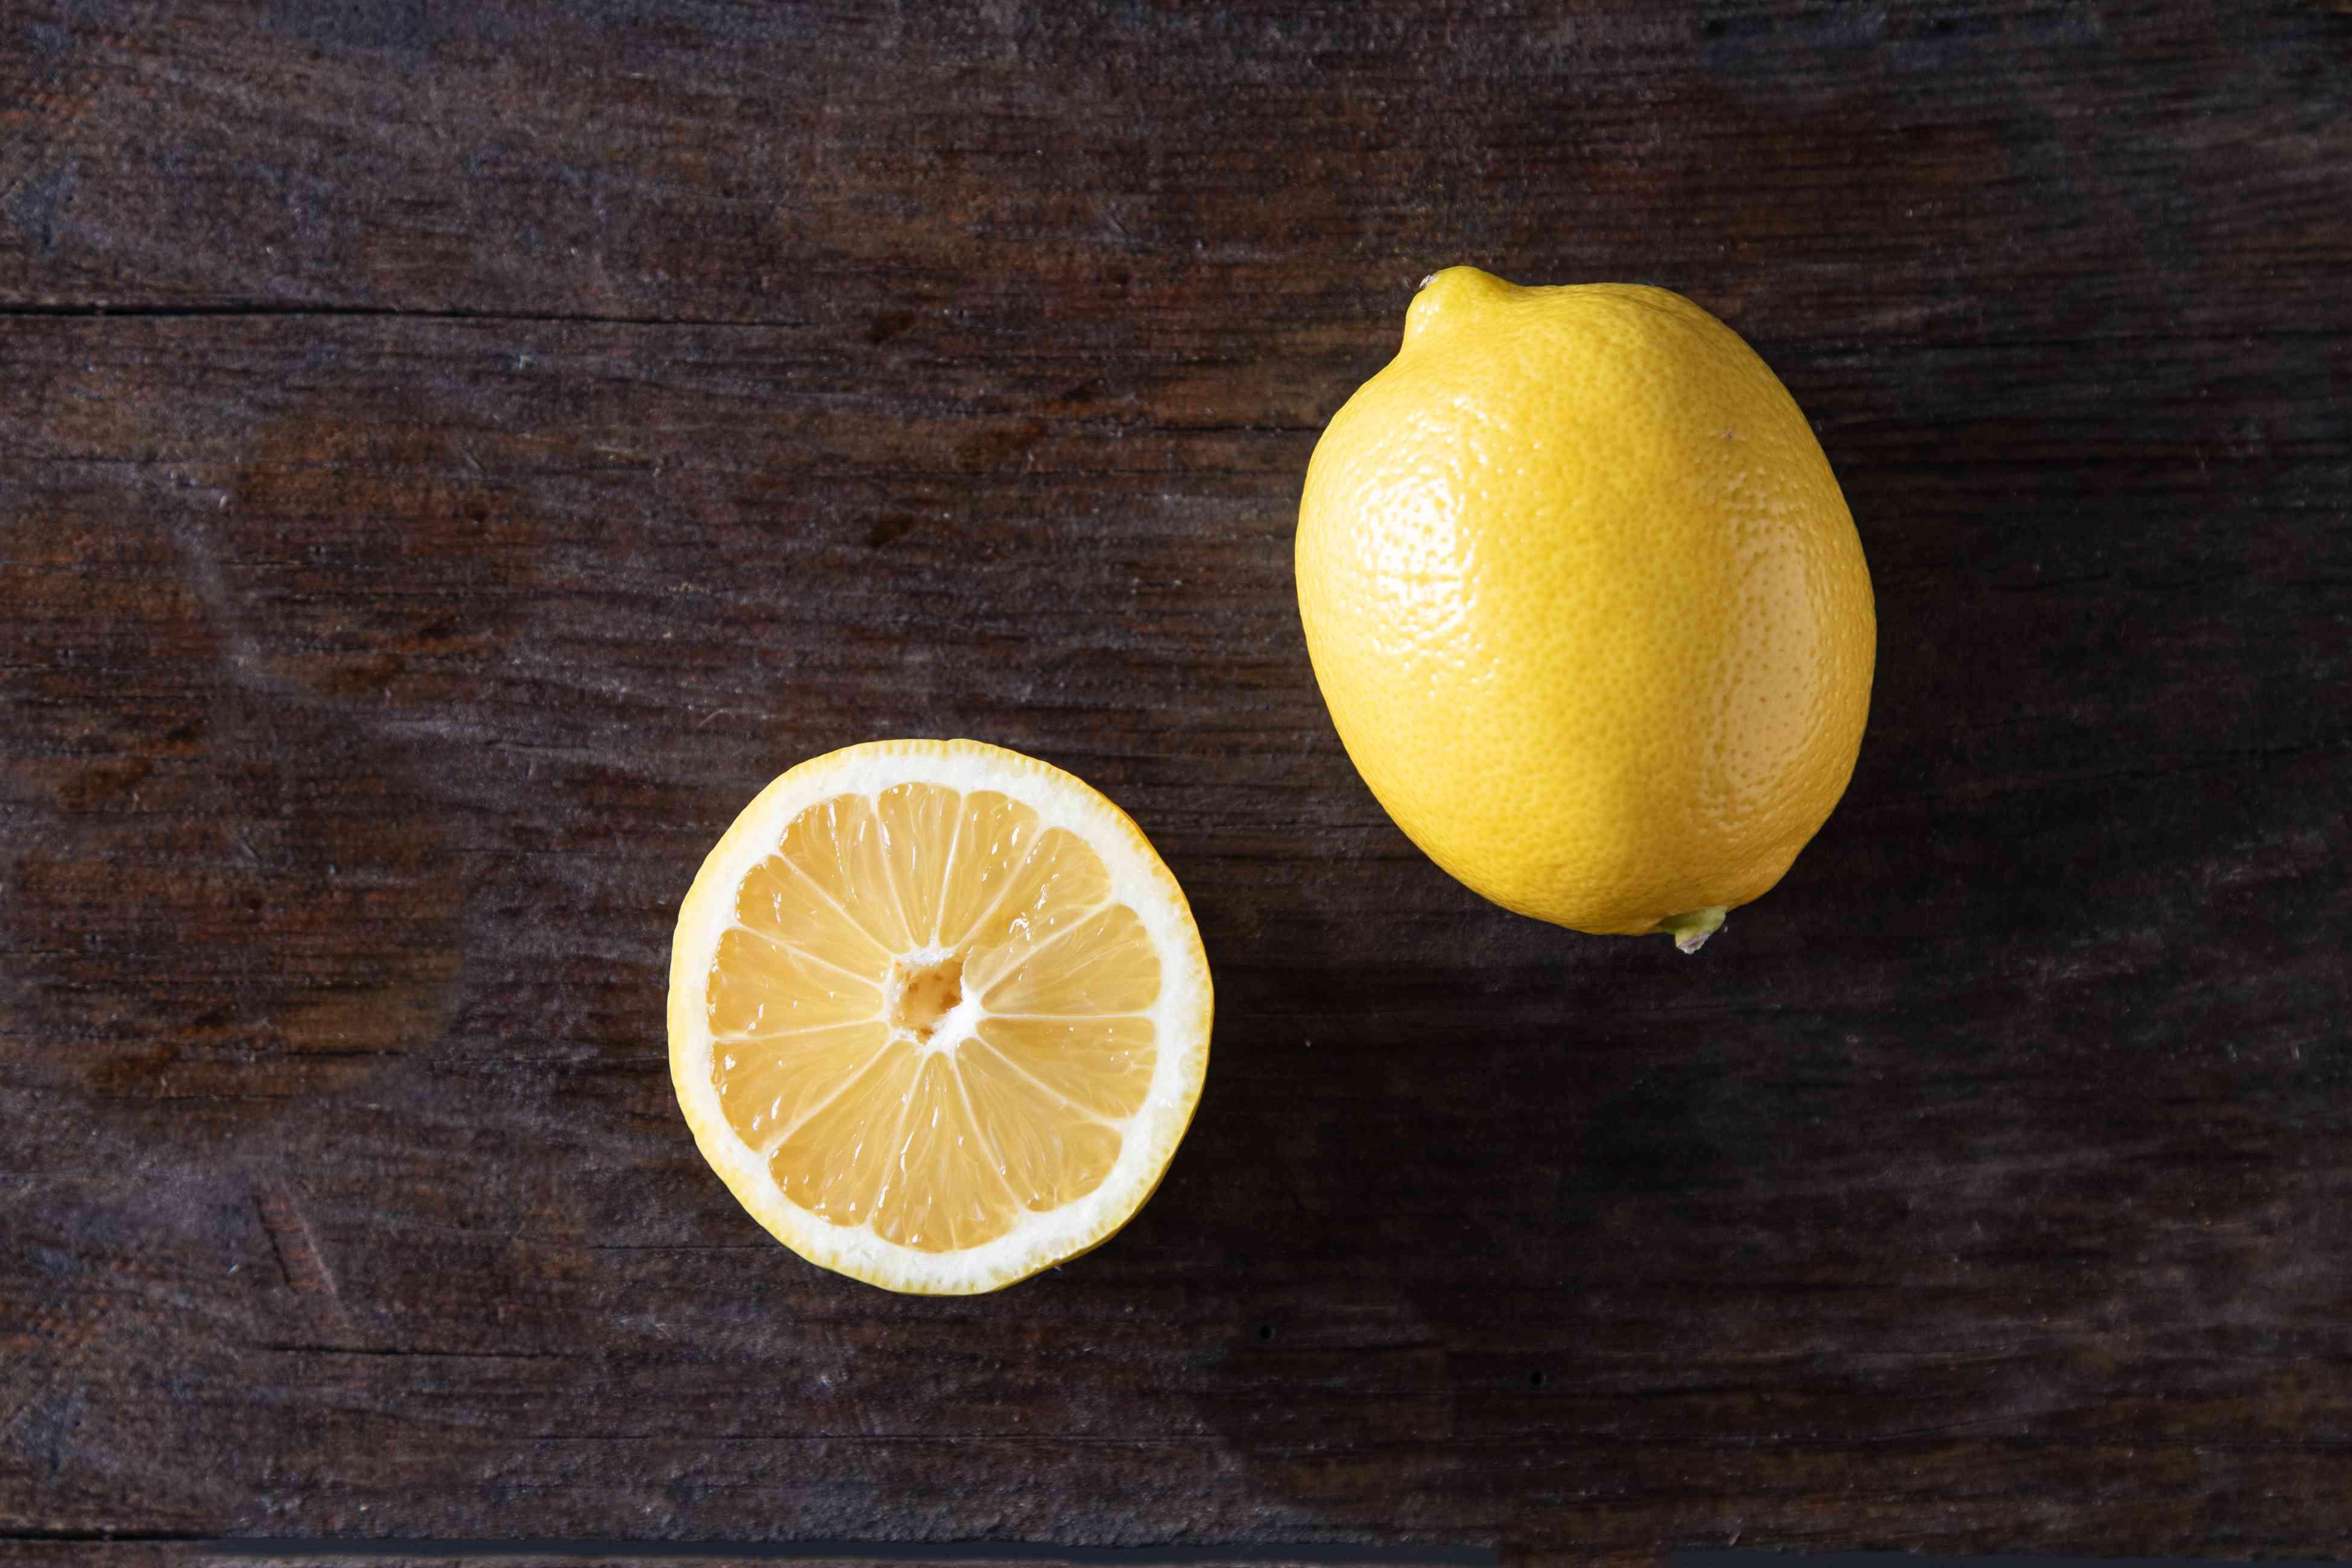 Eureka lemon on dark background